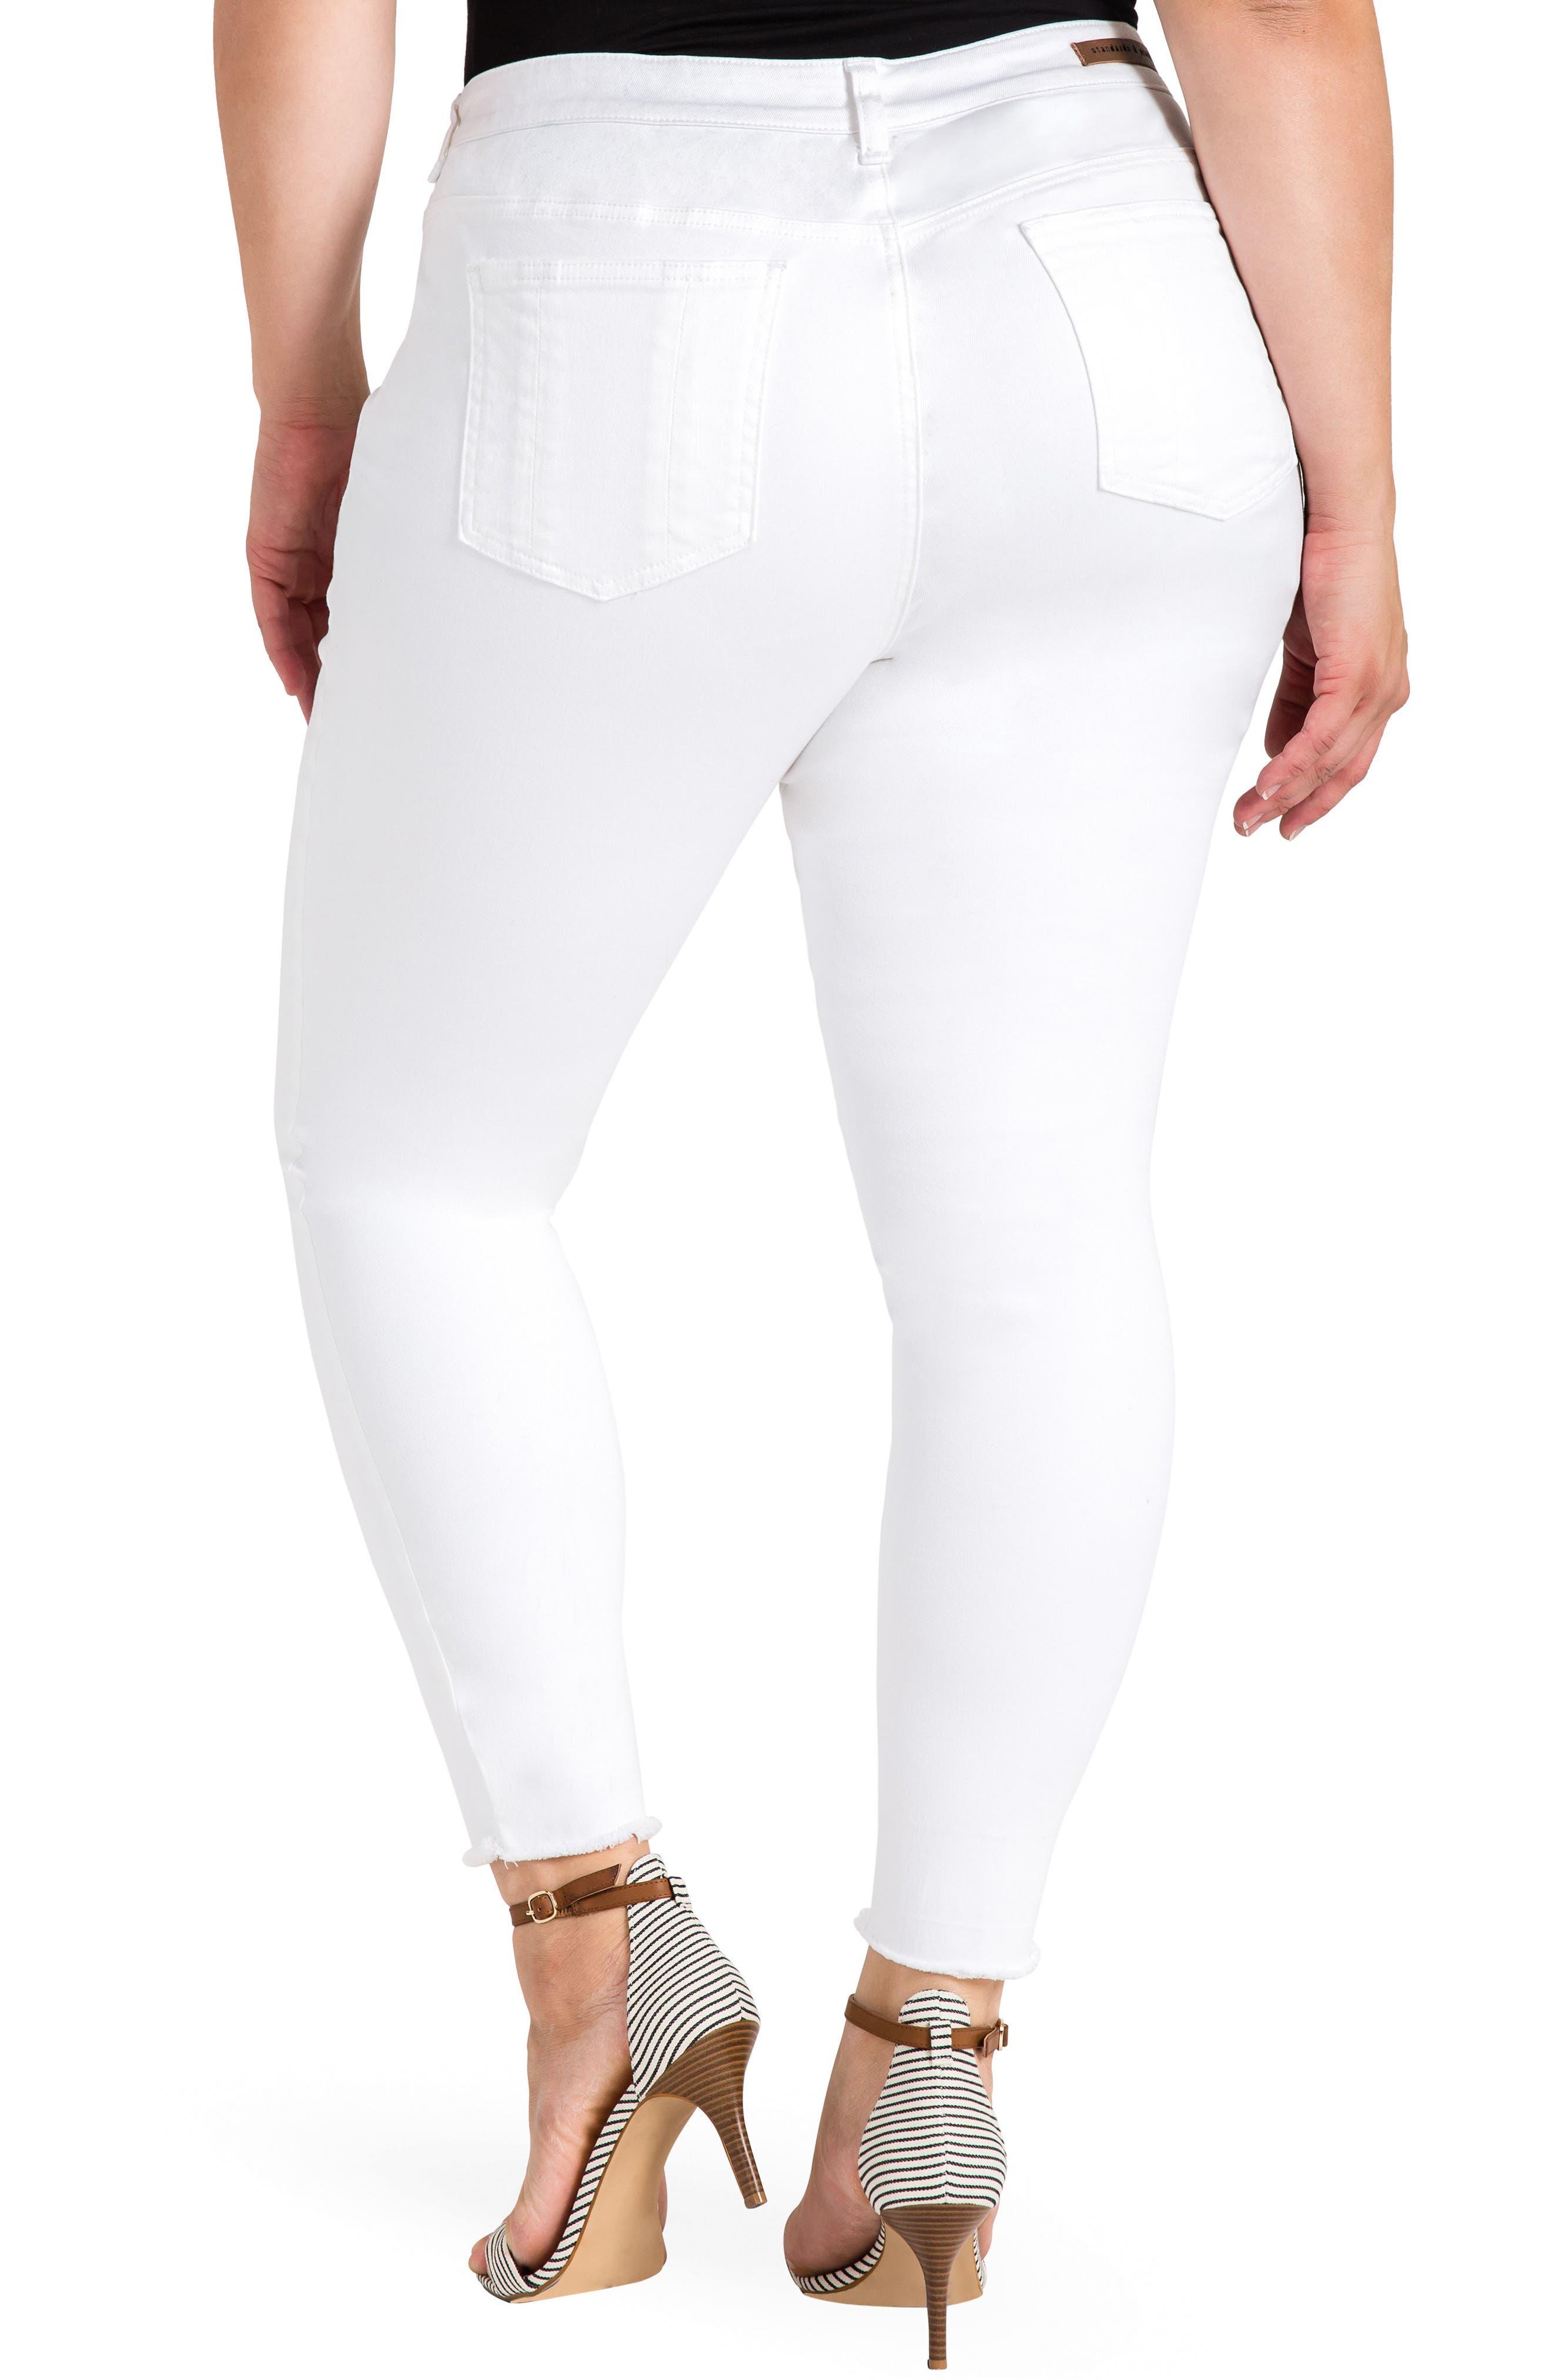 Virginia Ankle Skinny Jeans,                             Alternate thumbnail 2, color,                             3087Powderwt - White